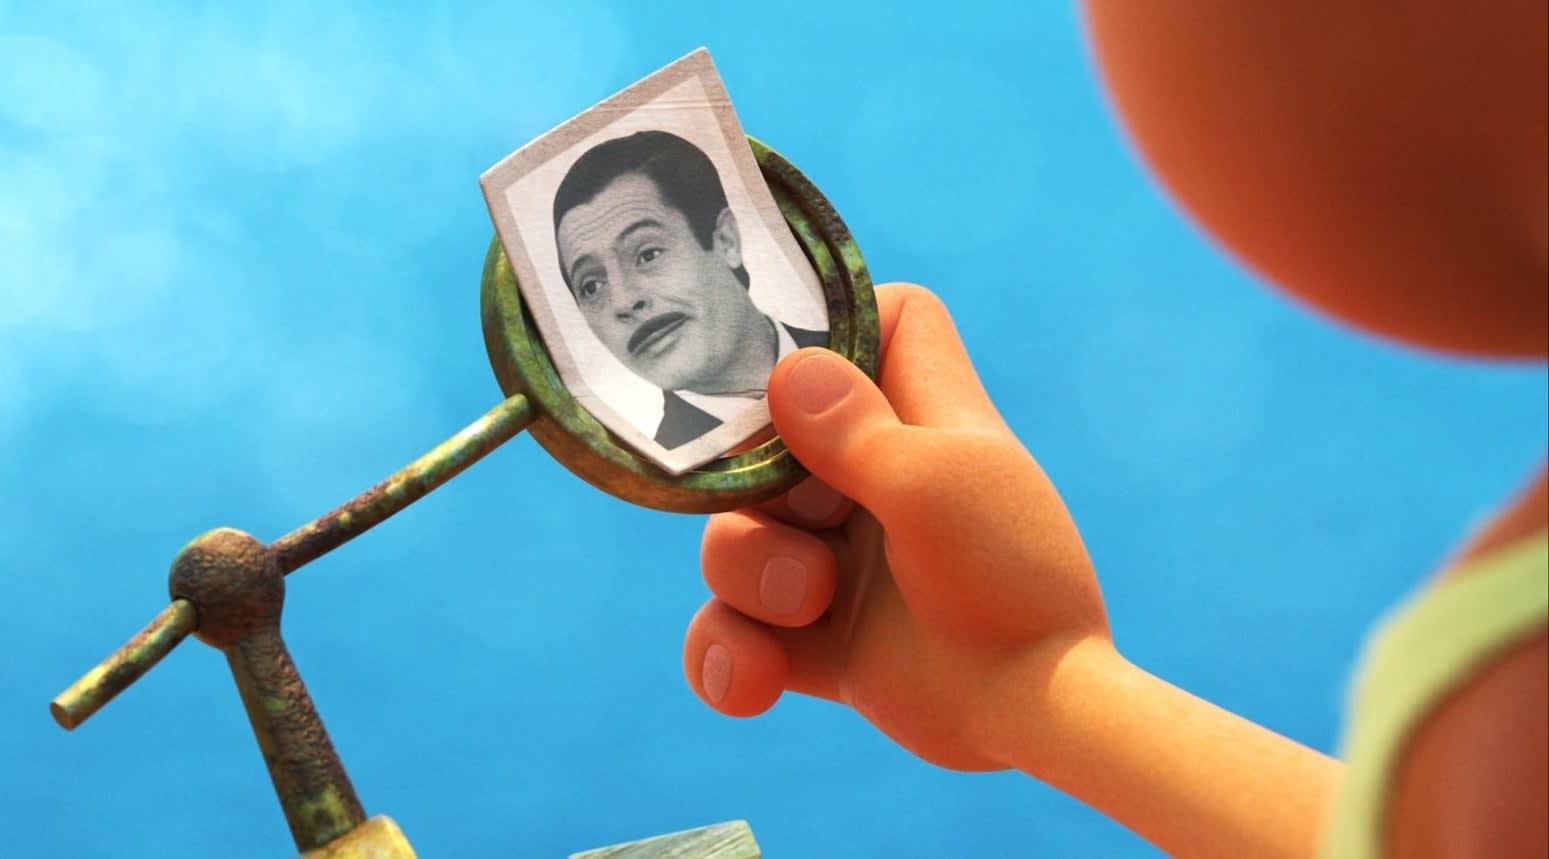 A boy looks at a photo